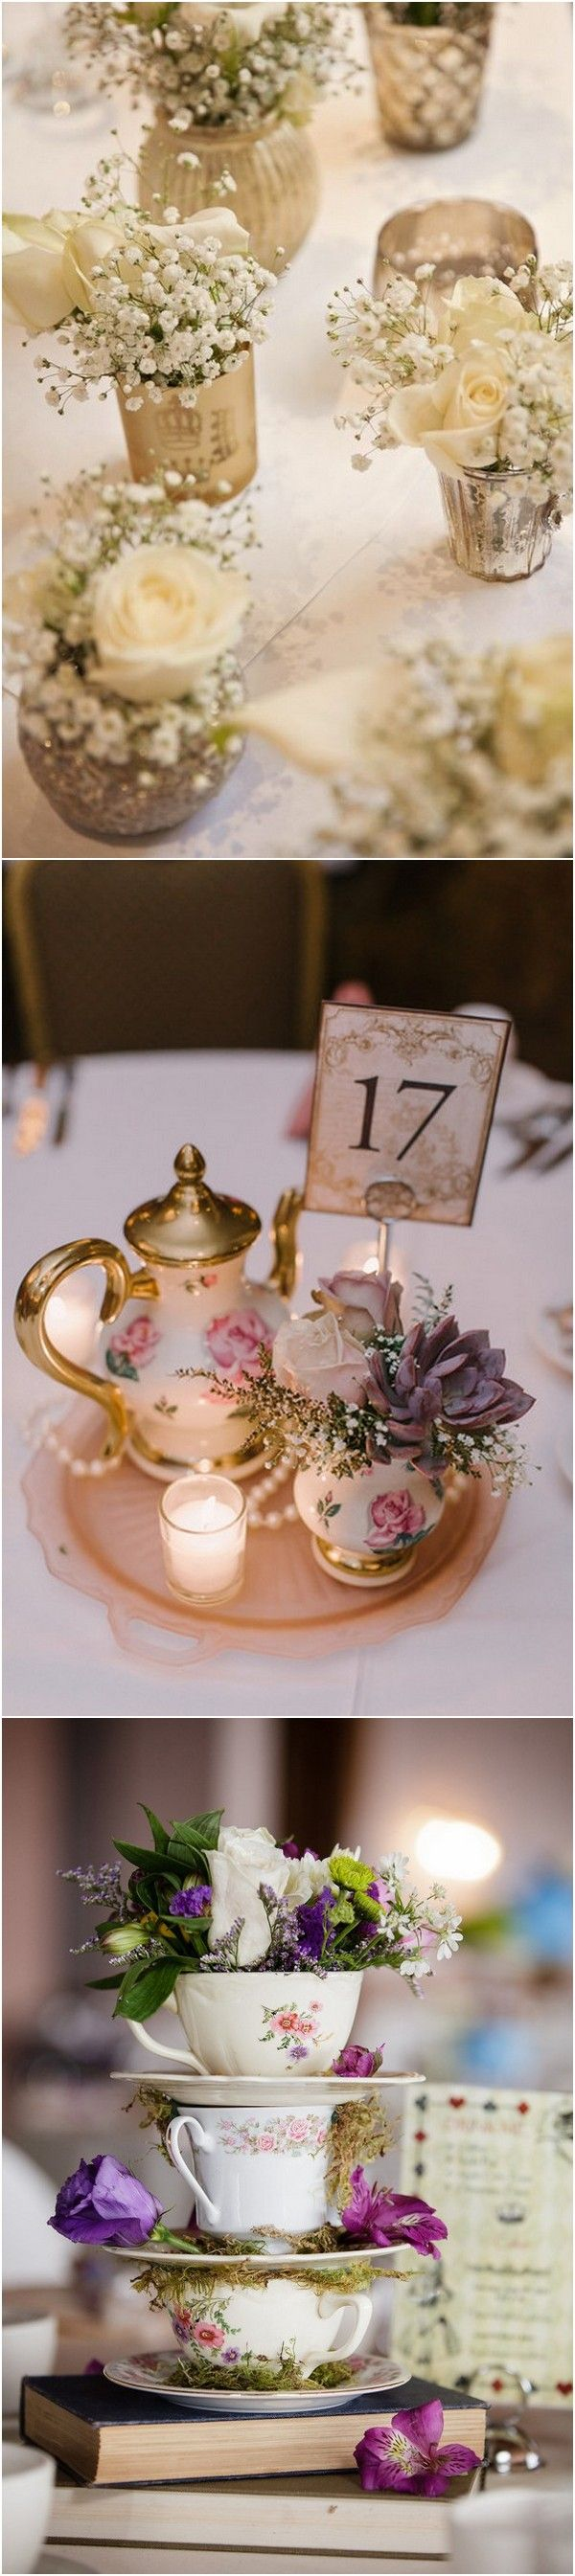 vintage teacup wedding centerpieces